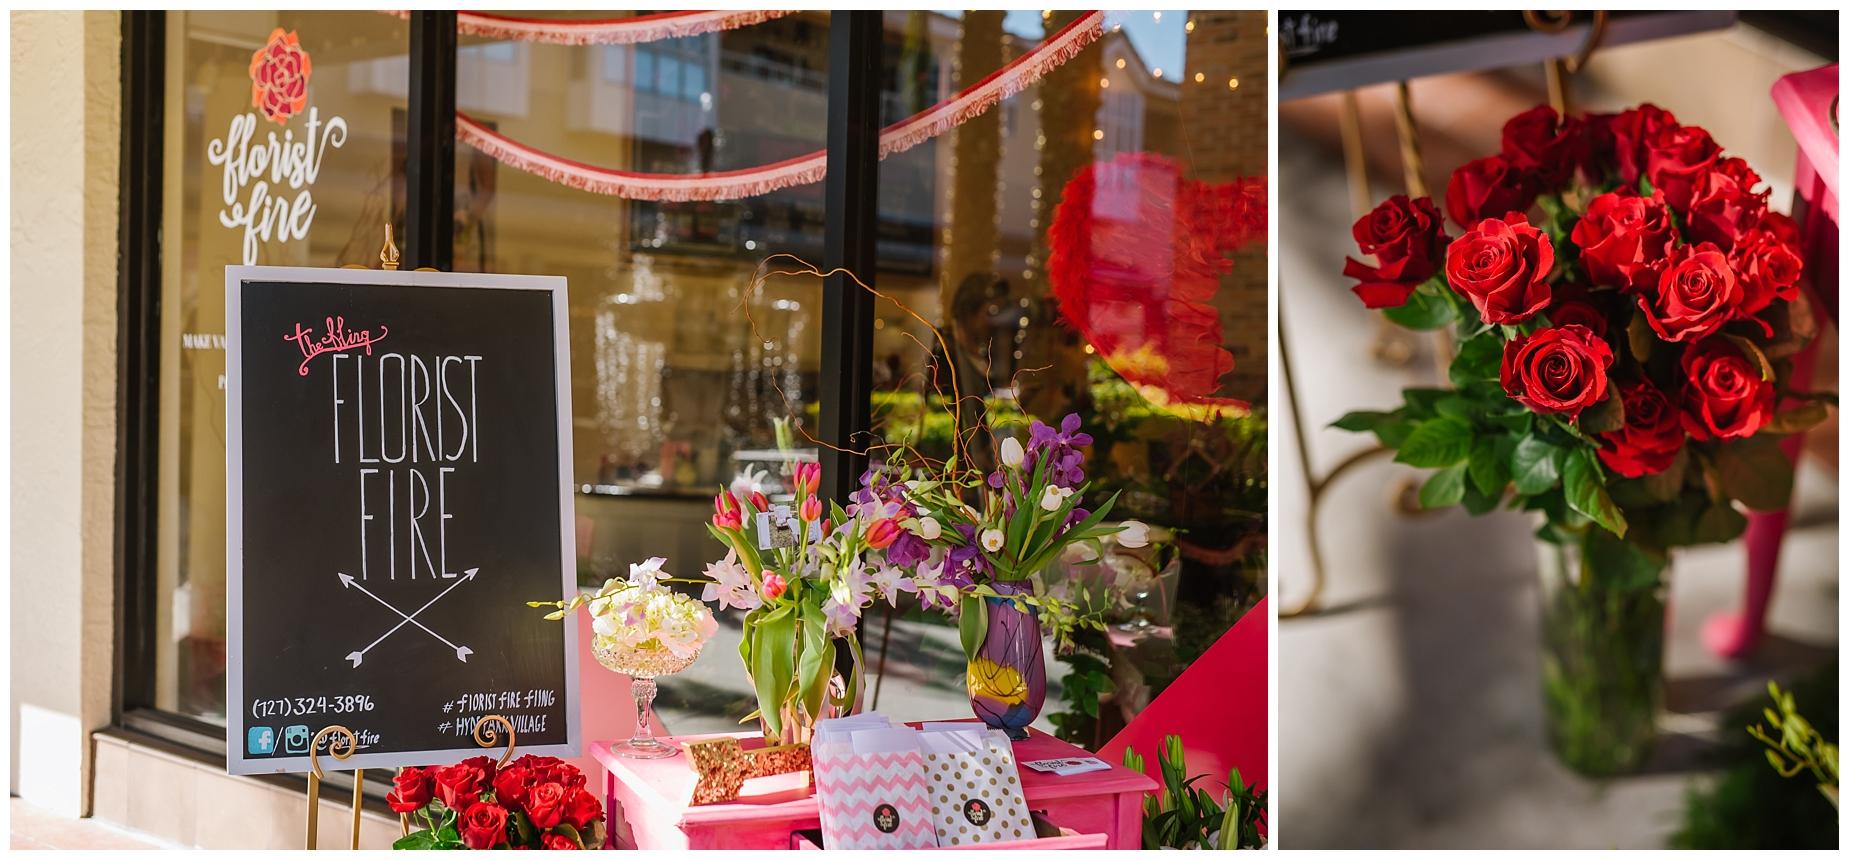 tampa-wedding-photographer-hyde-park-village-florist_0003.jpg